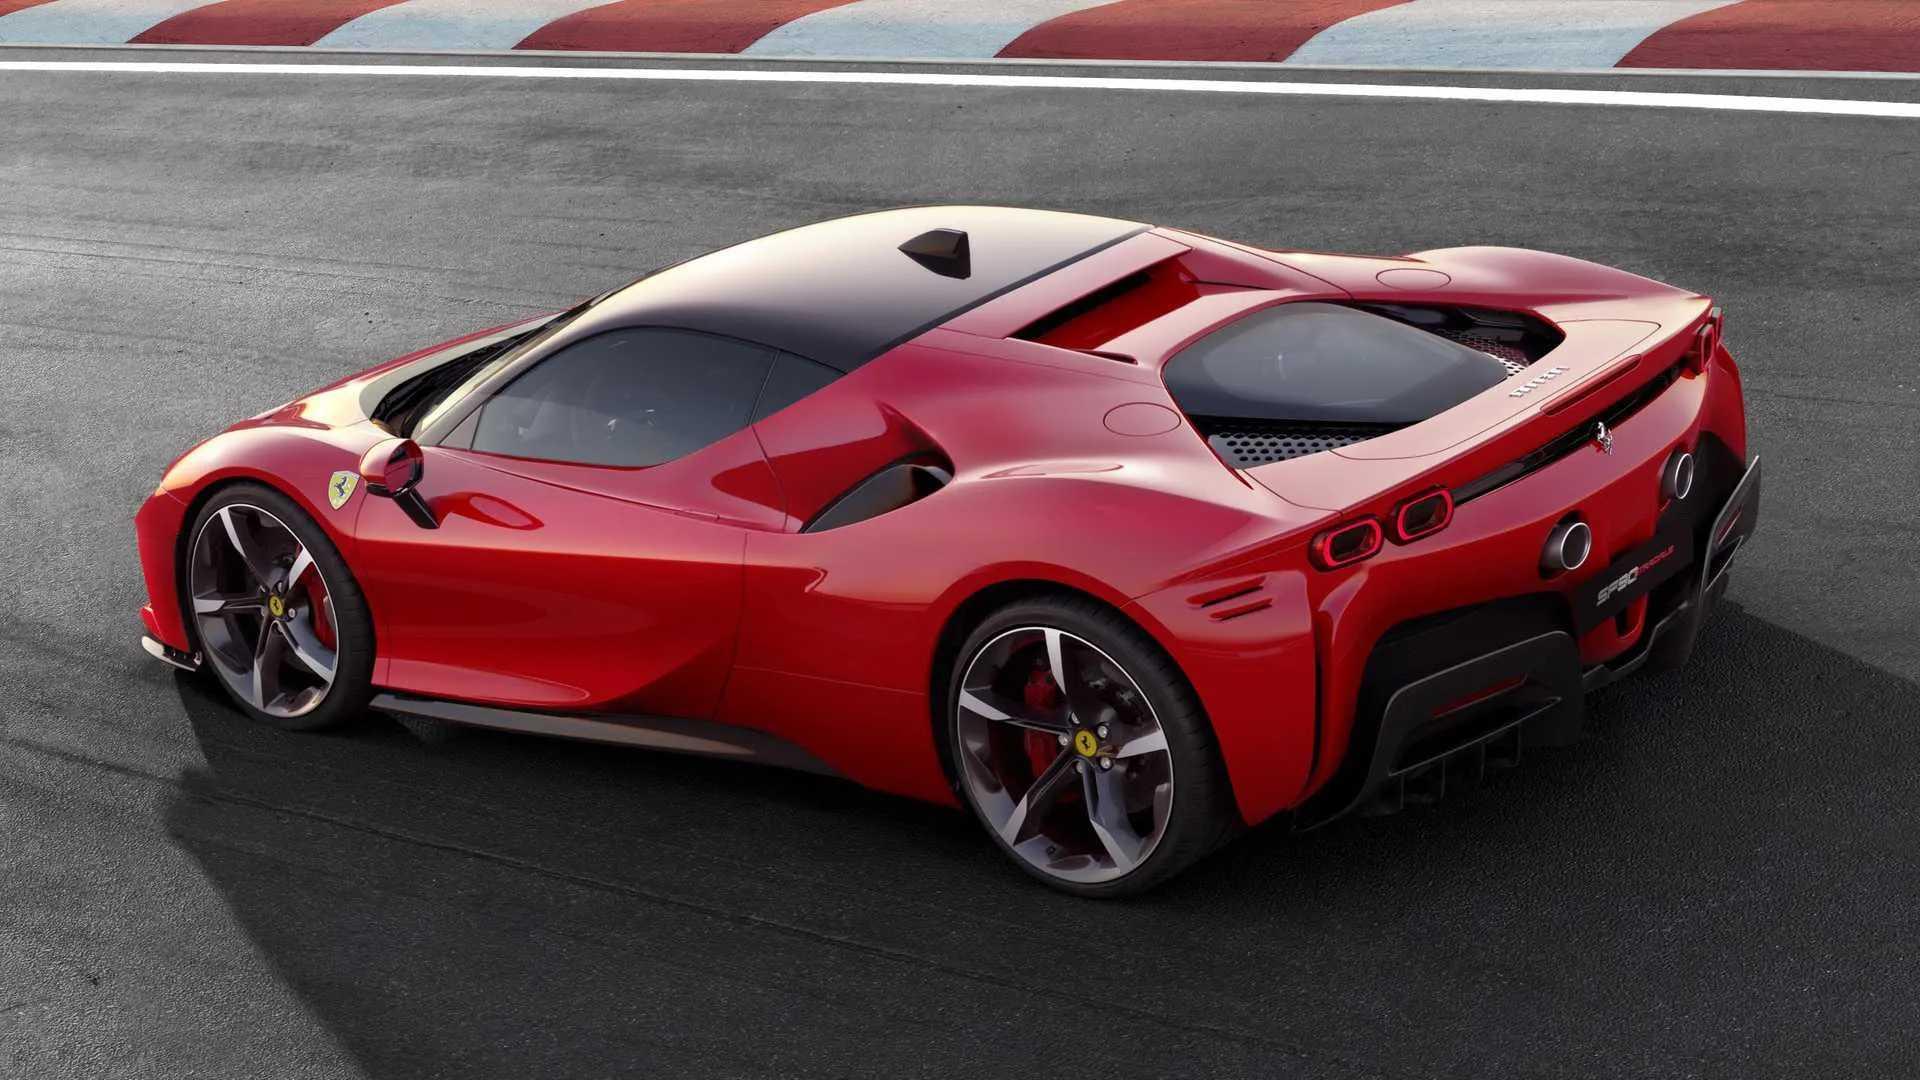 Ferrari won't launch a dedicated EV supercar until after 2025